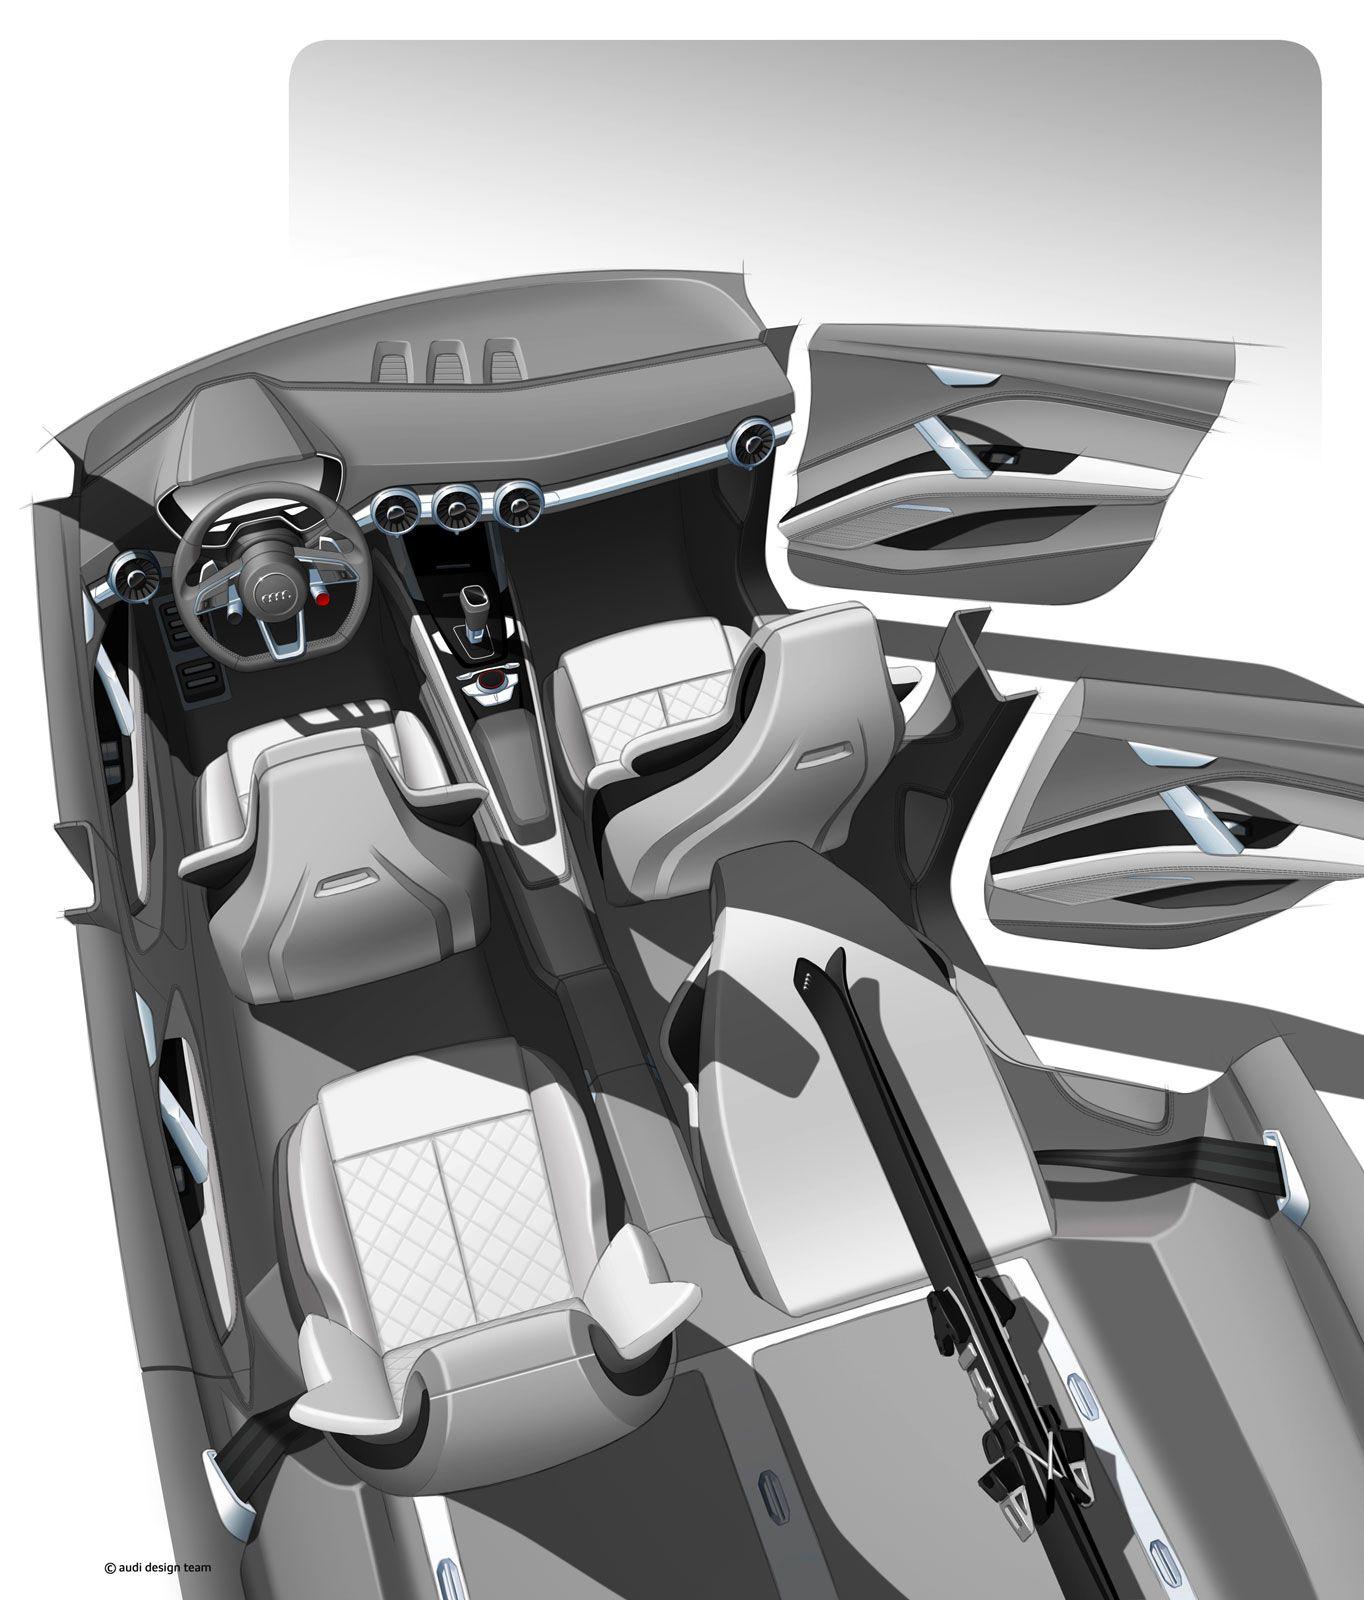 #Audi Crossover Concept for Beijing 2014 - Interior Design Rendering #concept #design #sketch